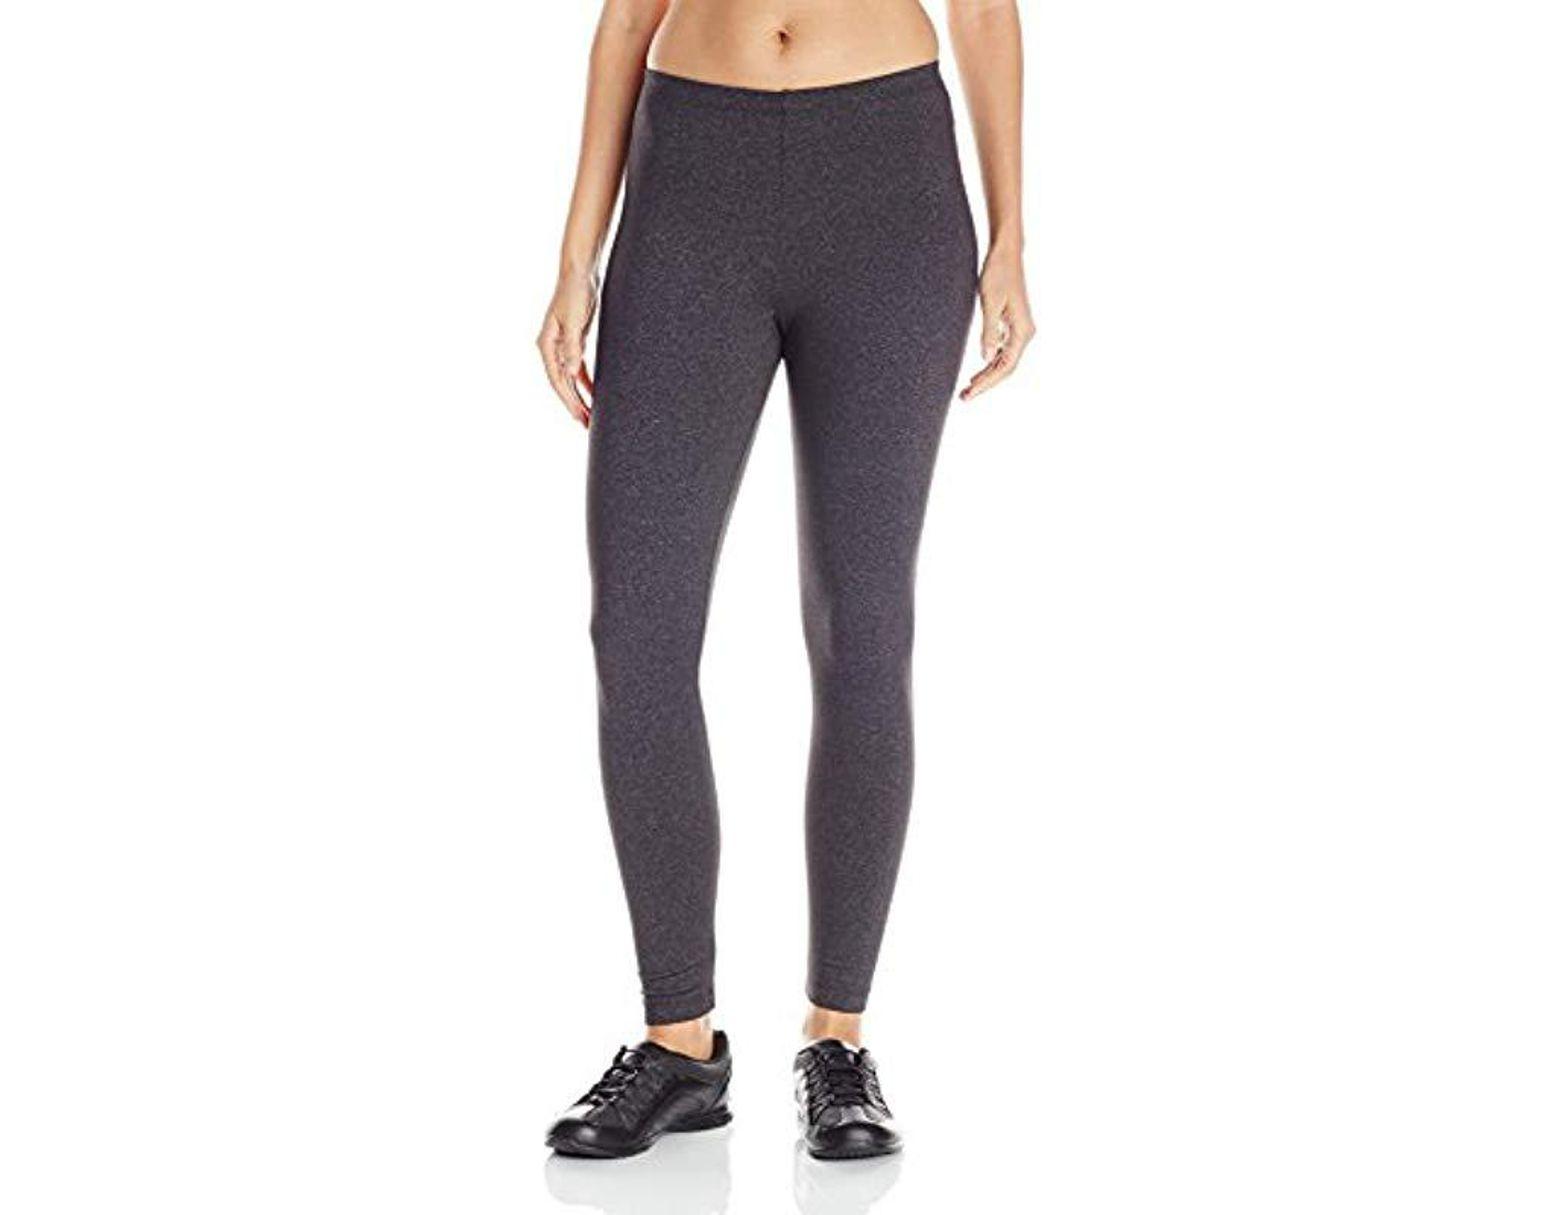 29b060ea151c8 Danskin Classic Supplex Body Fit Ankle Legging in Gray - Lyst